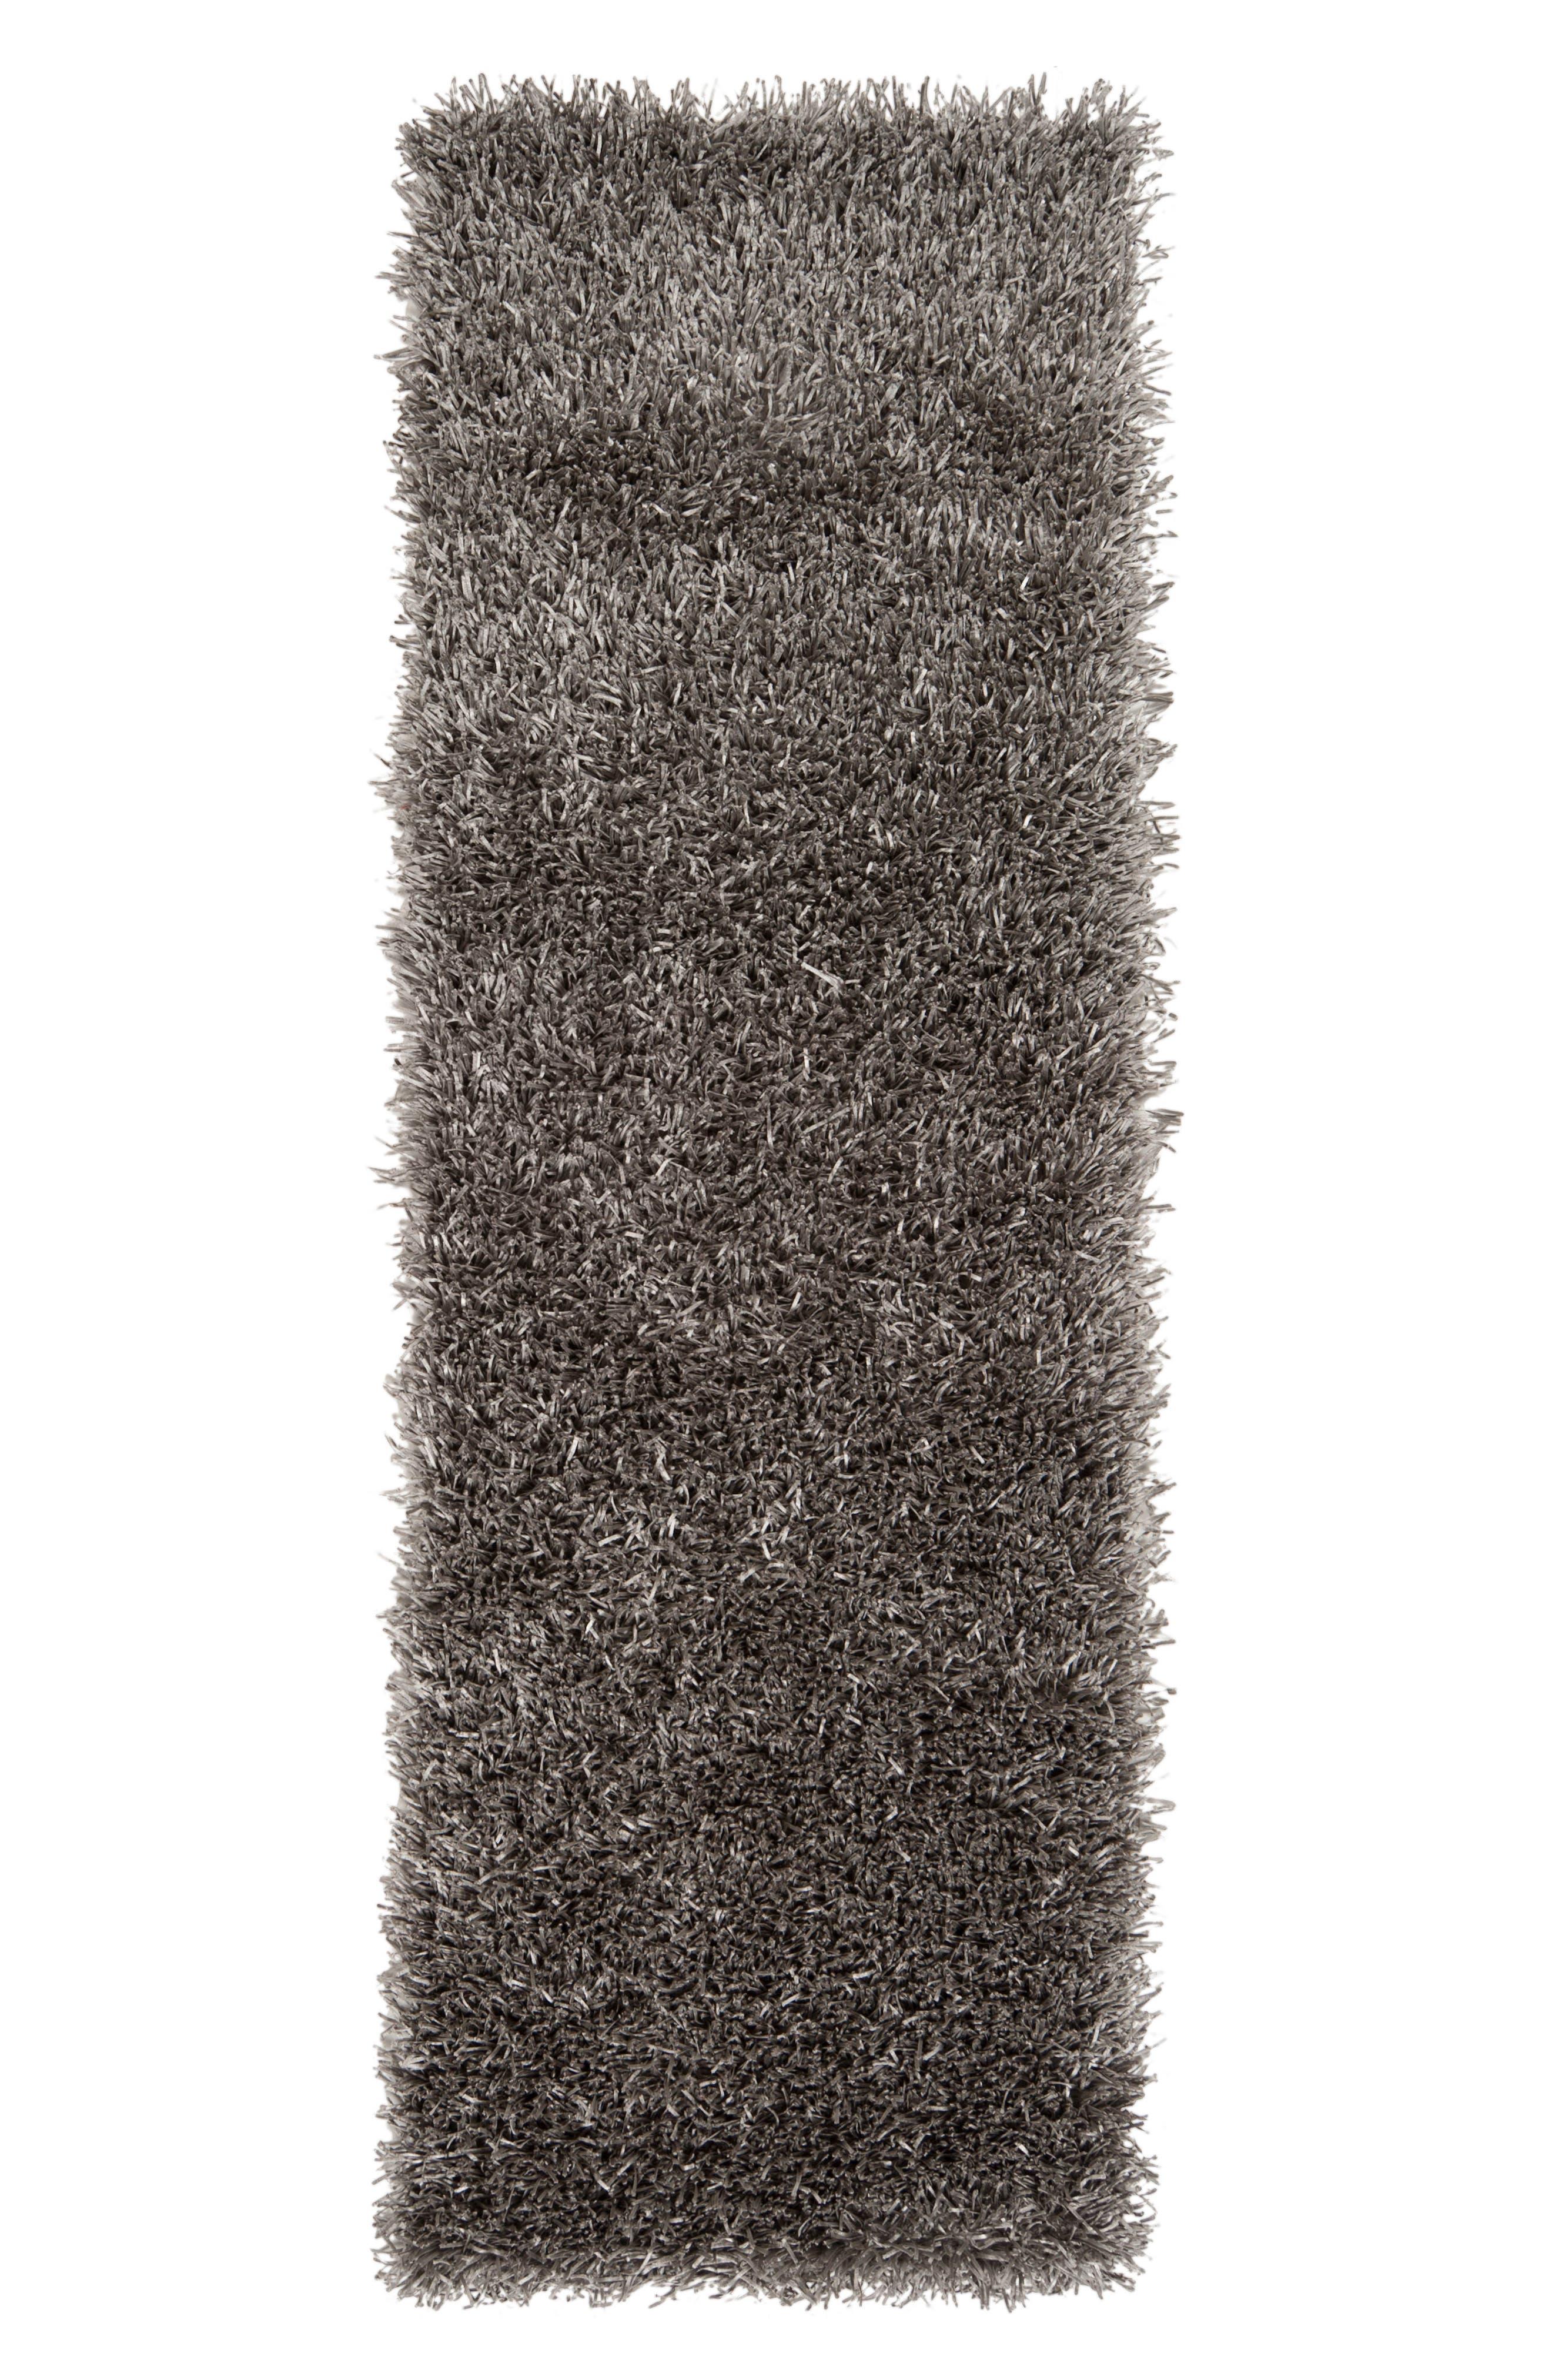 Shimmer Area Rug,                         Main,                         color, 020